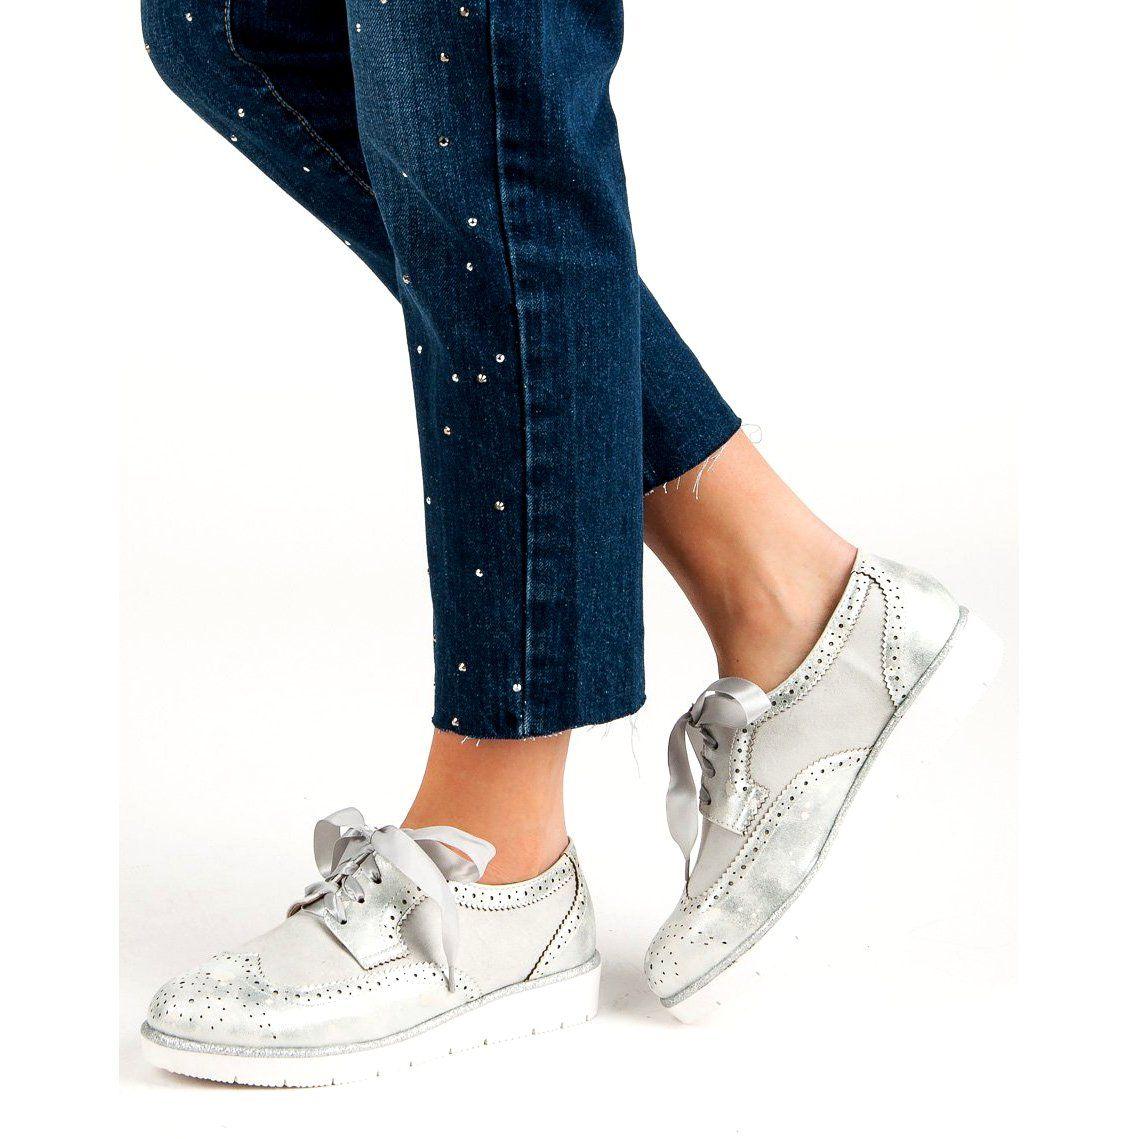 Vices Polbuty Wiazane Wstazka Szare Womens Oxfords Oxford Shoes Fashion